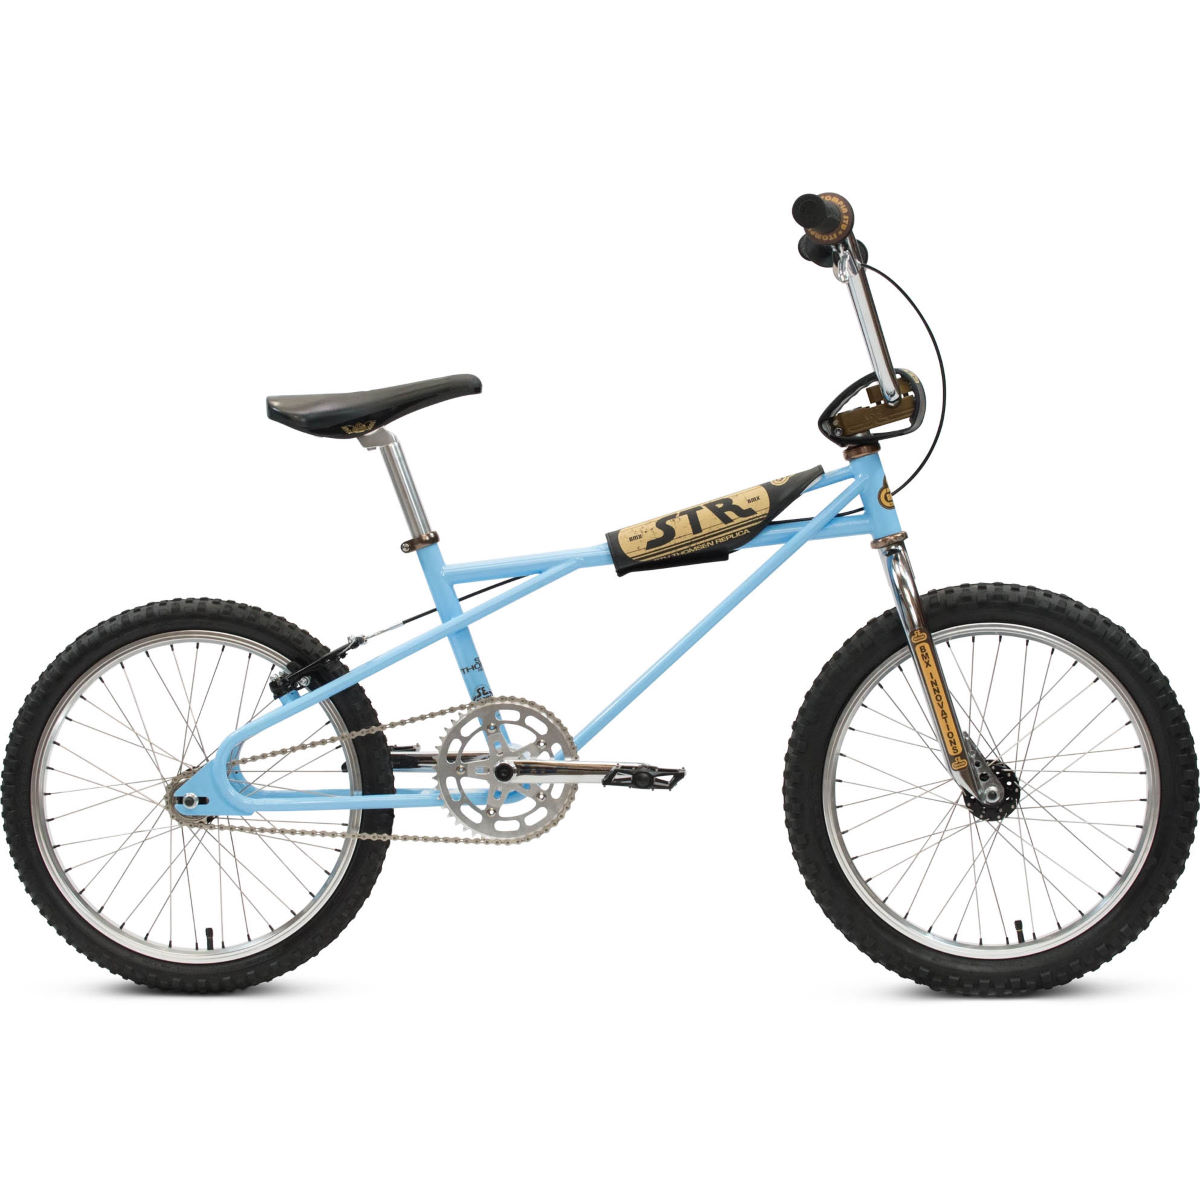 SE Bikes STR 1 Quadangle 24 SE Freestyle Bikes